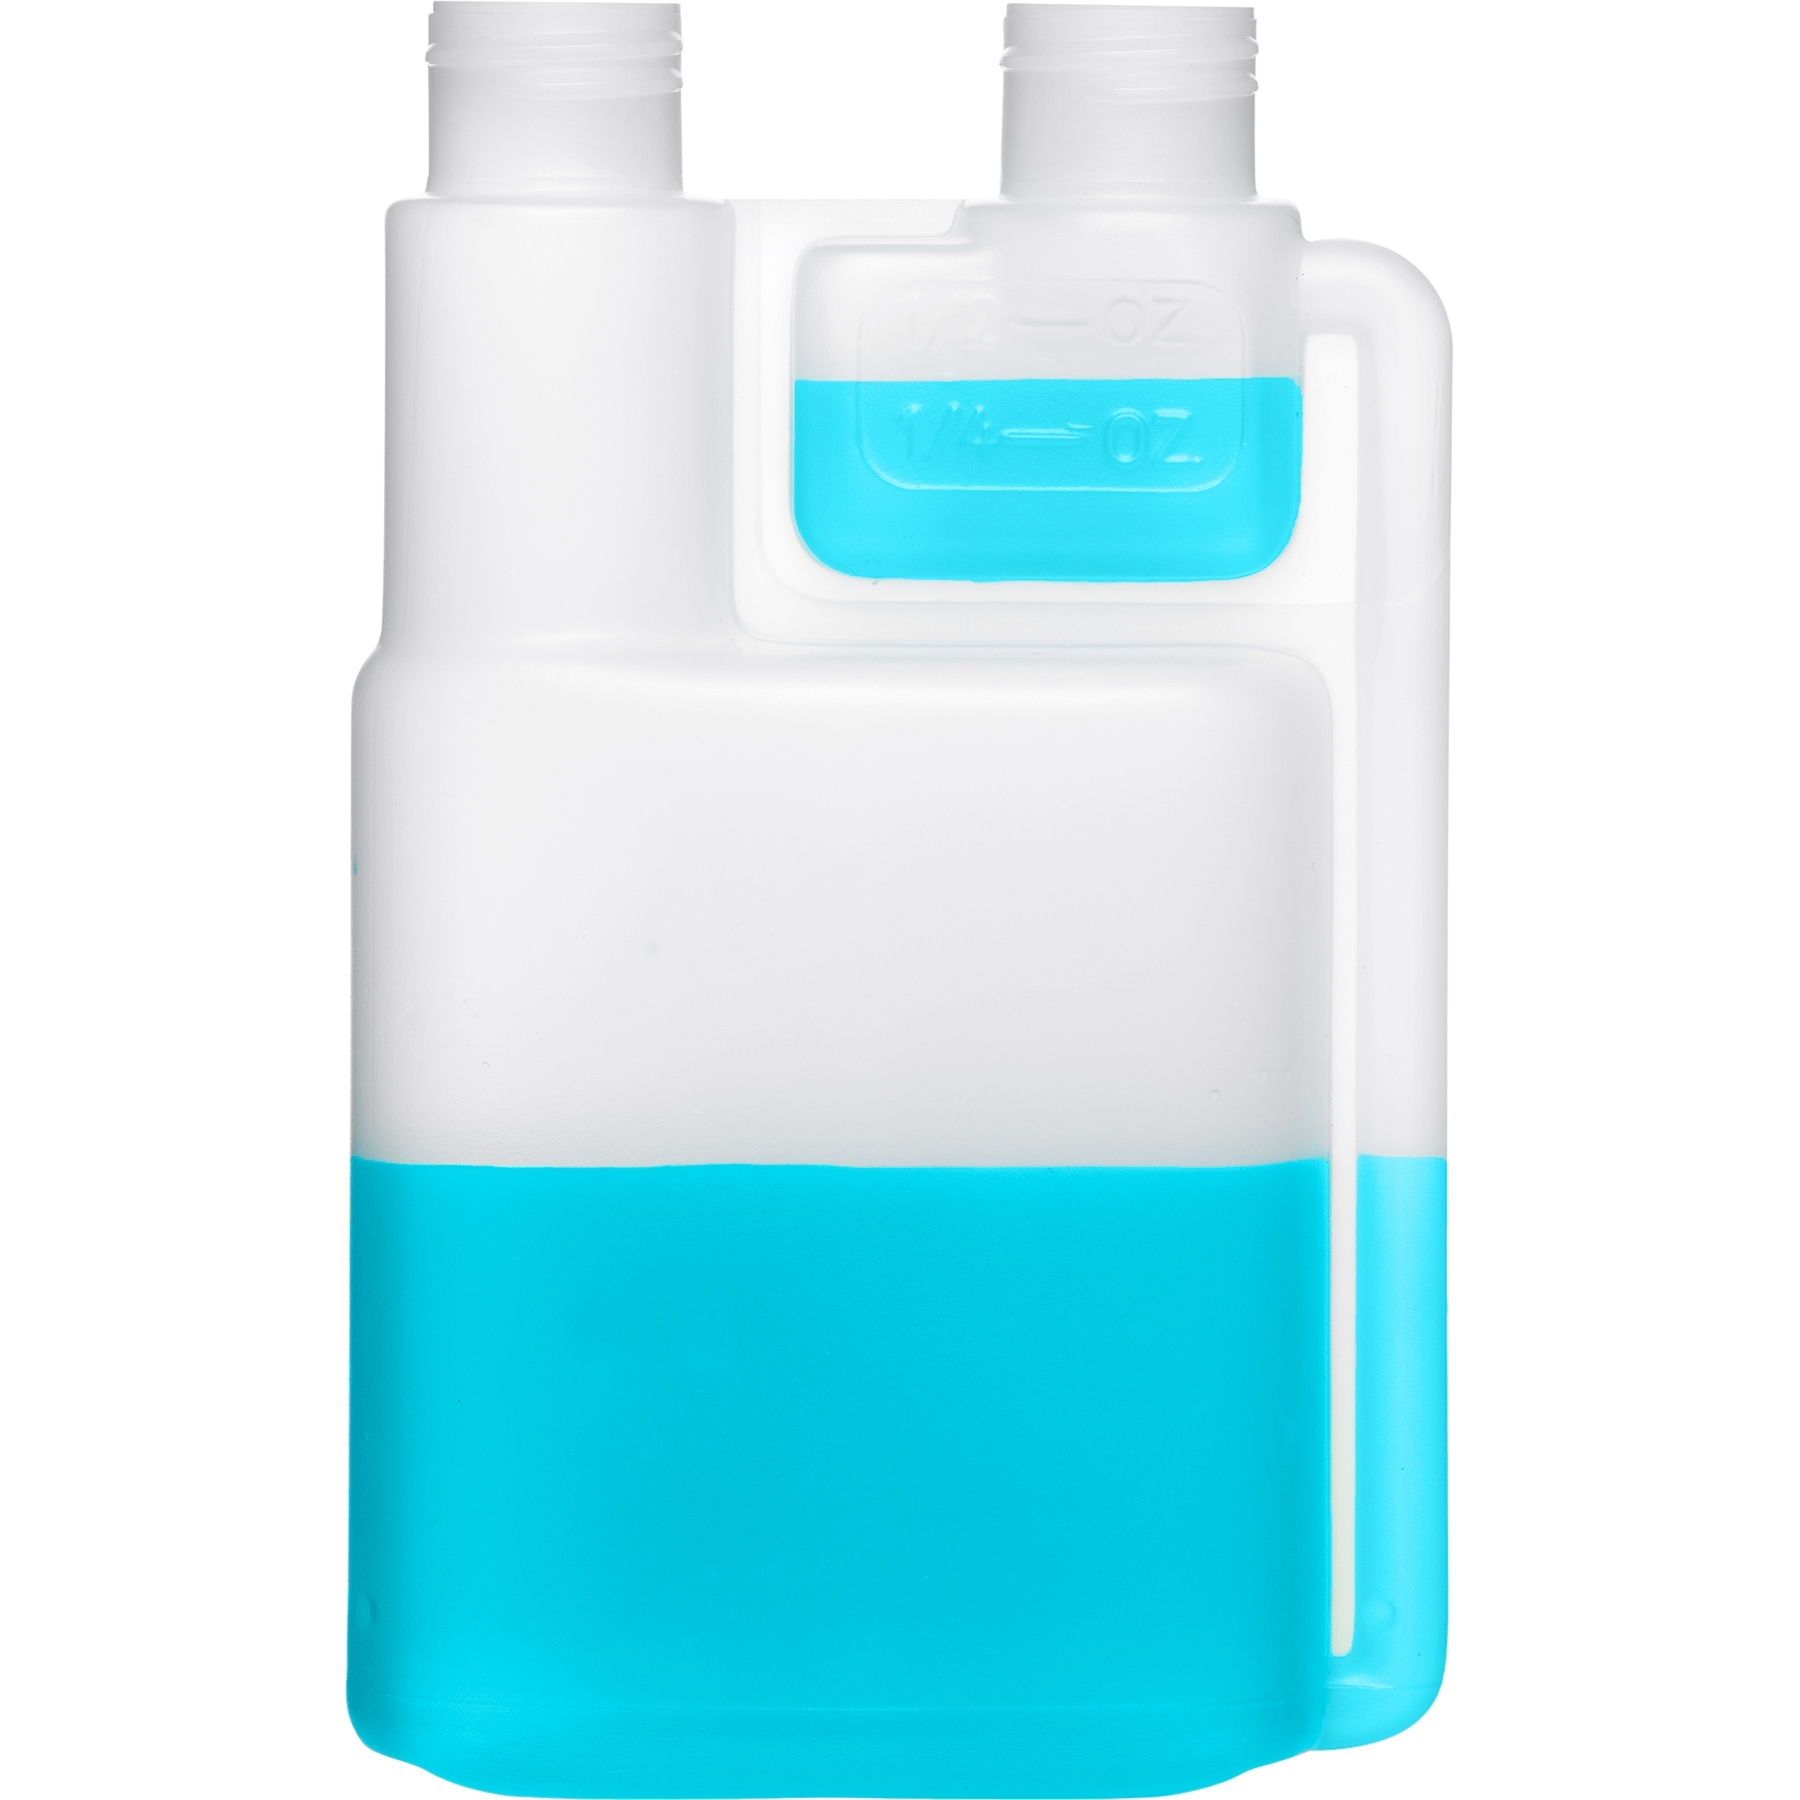 "High Density Polyethylene HDPE Plastic Sheet 1/"" x 12"" x 12/"" Natural Textured"